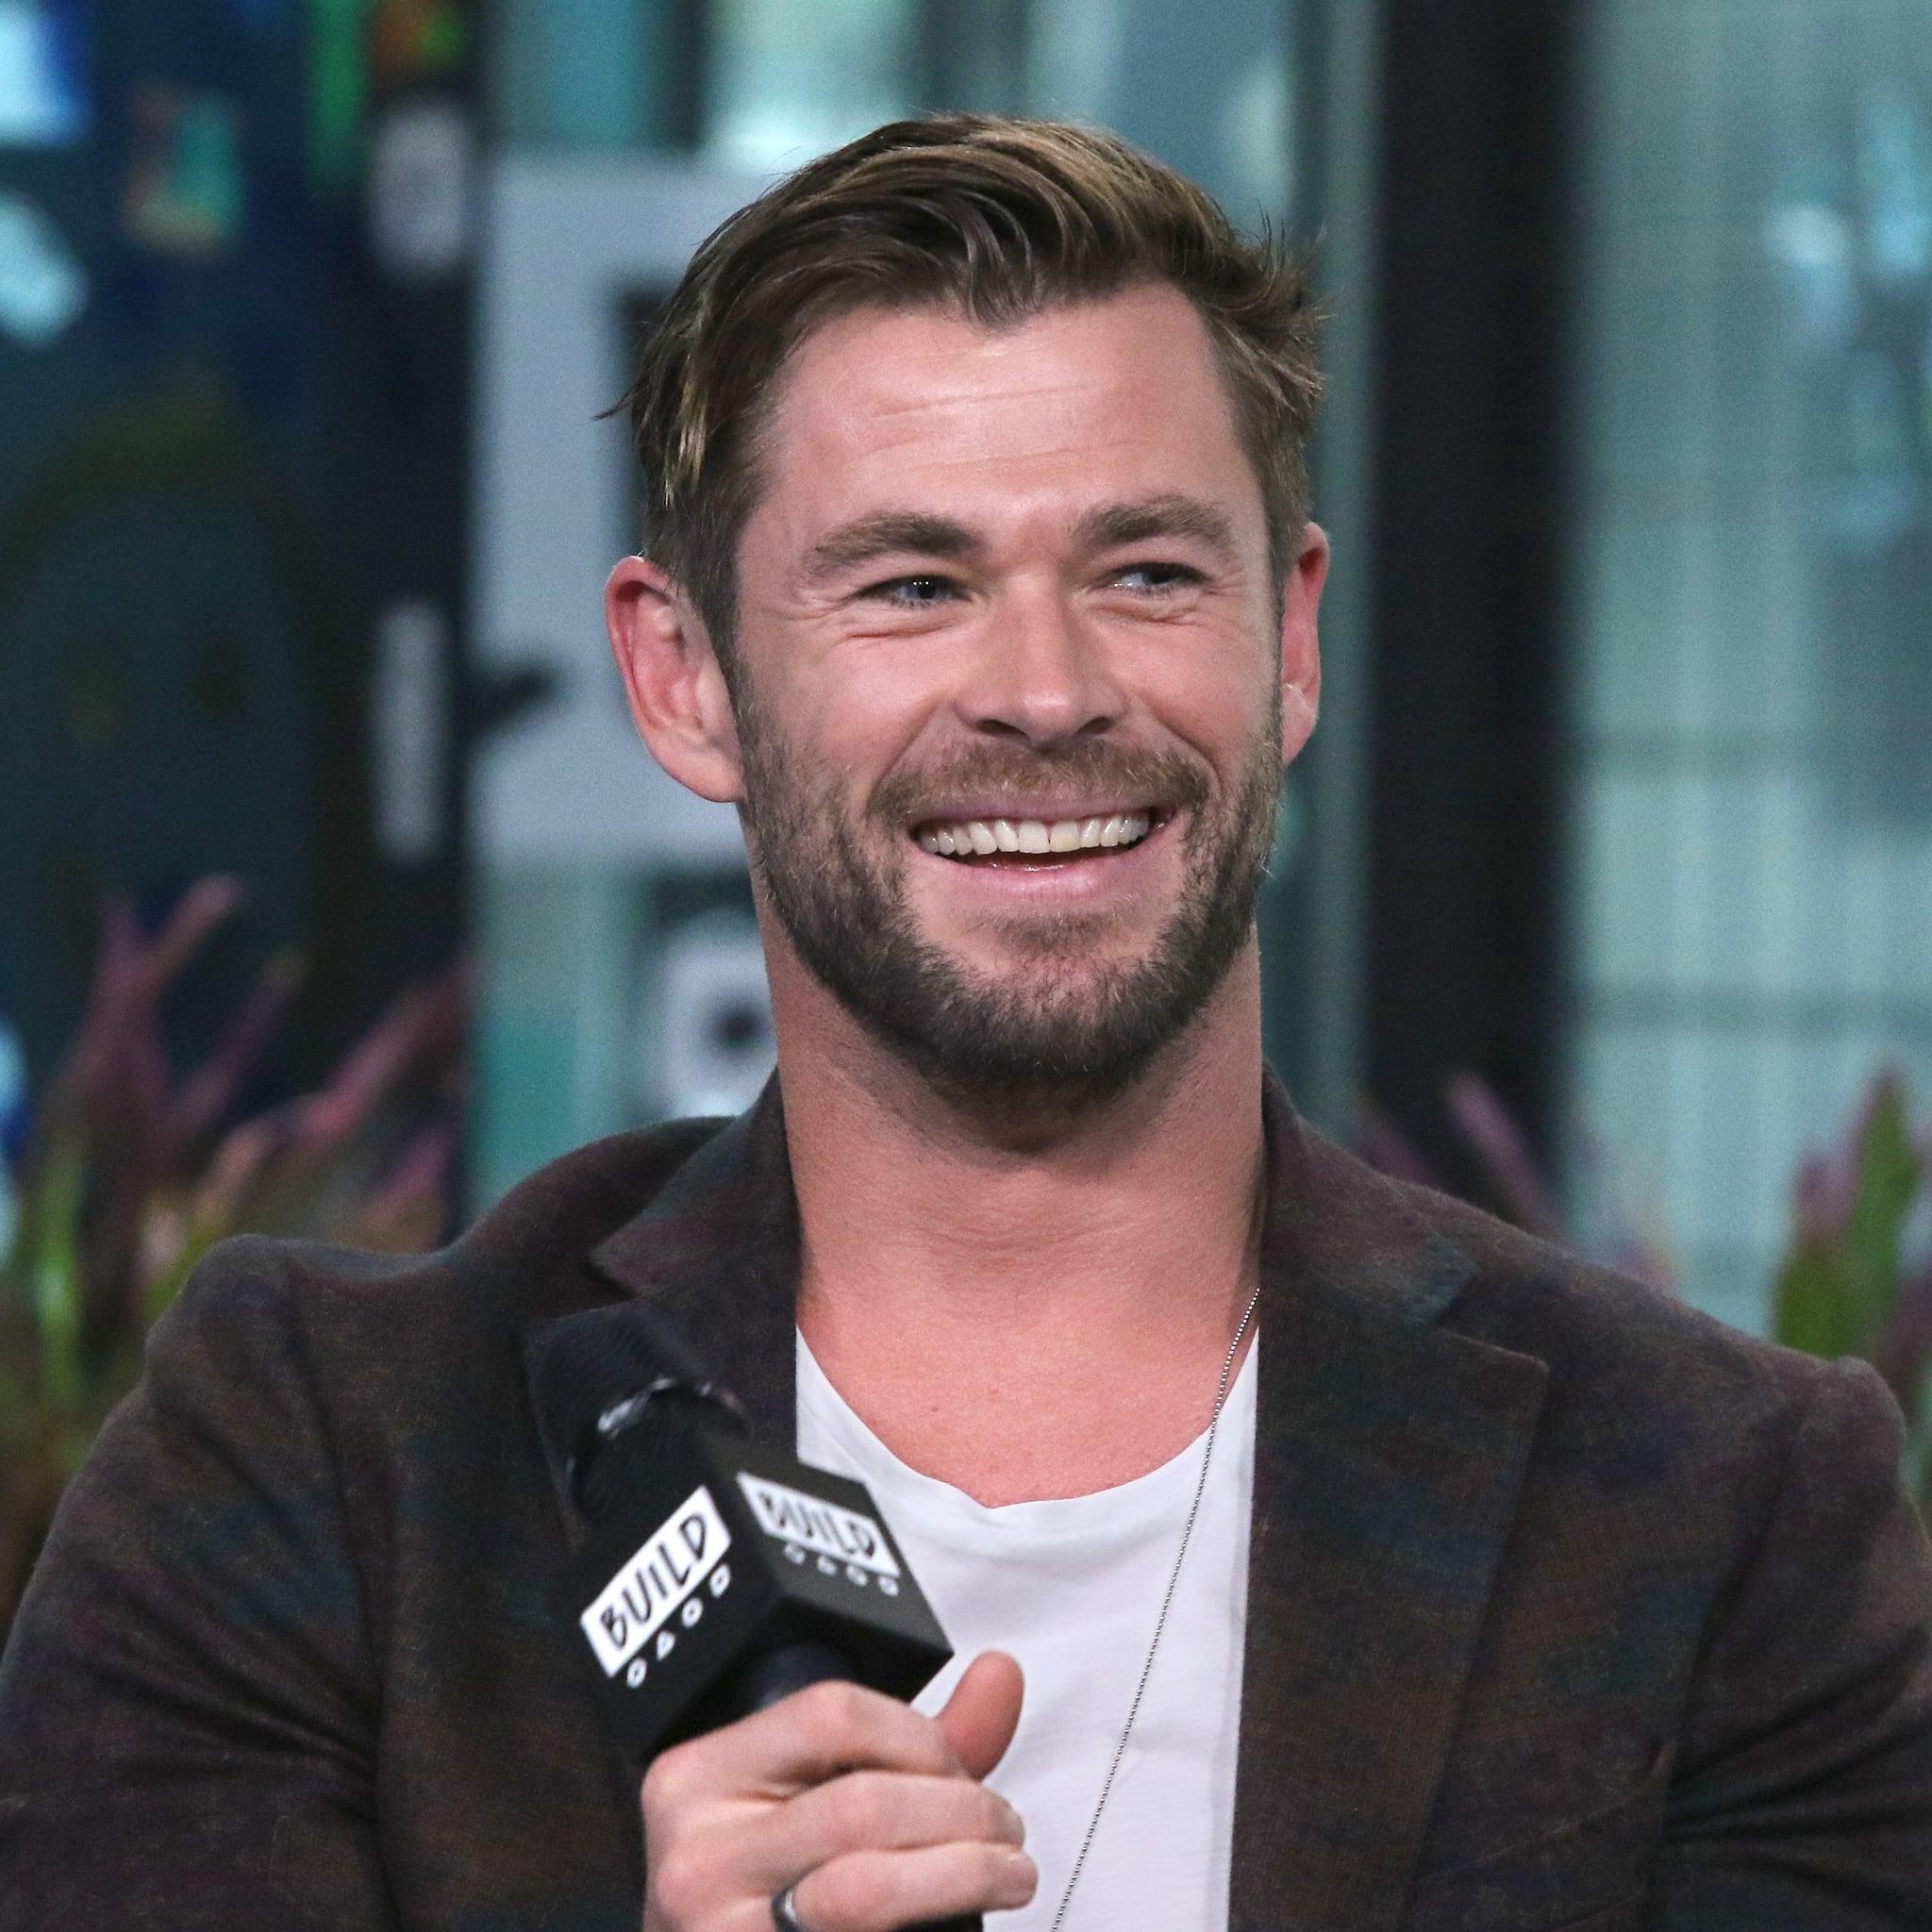 Chris Hemsworth Instagram Weights Workout Video   POPSUGAR Fitness UK